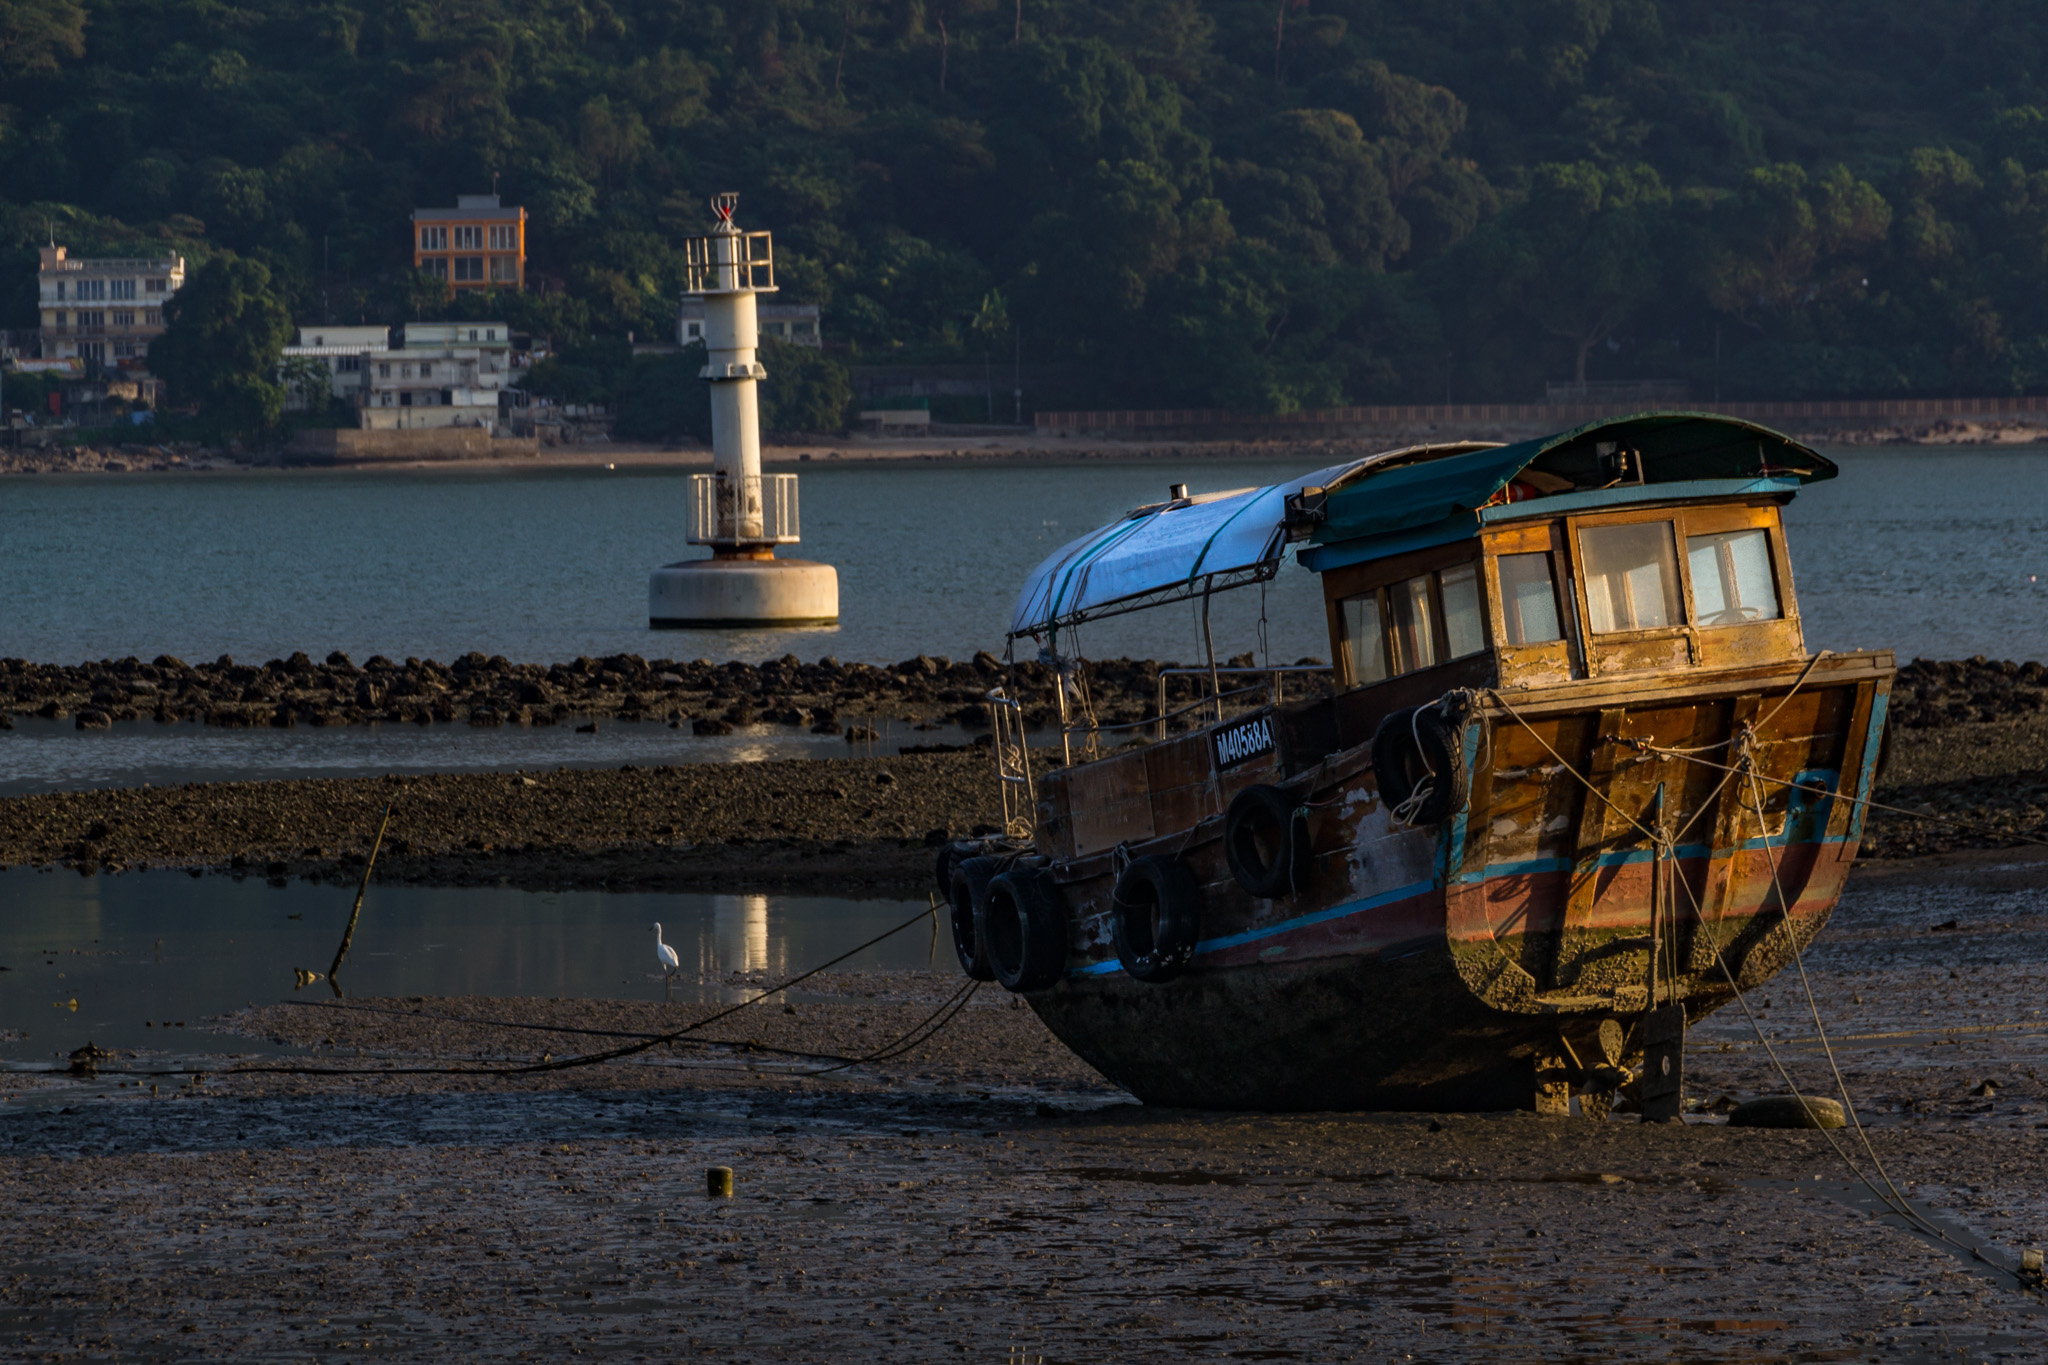 Tai O - kalastajakylä Hongkongissa